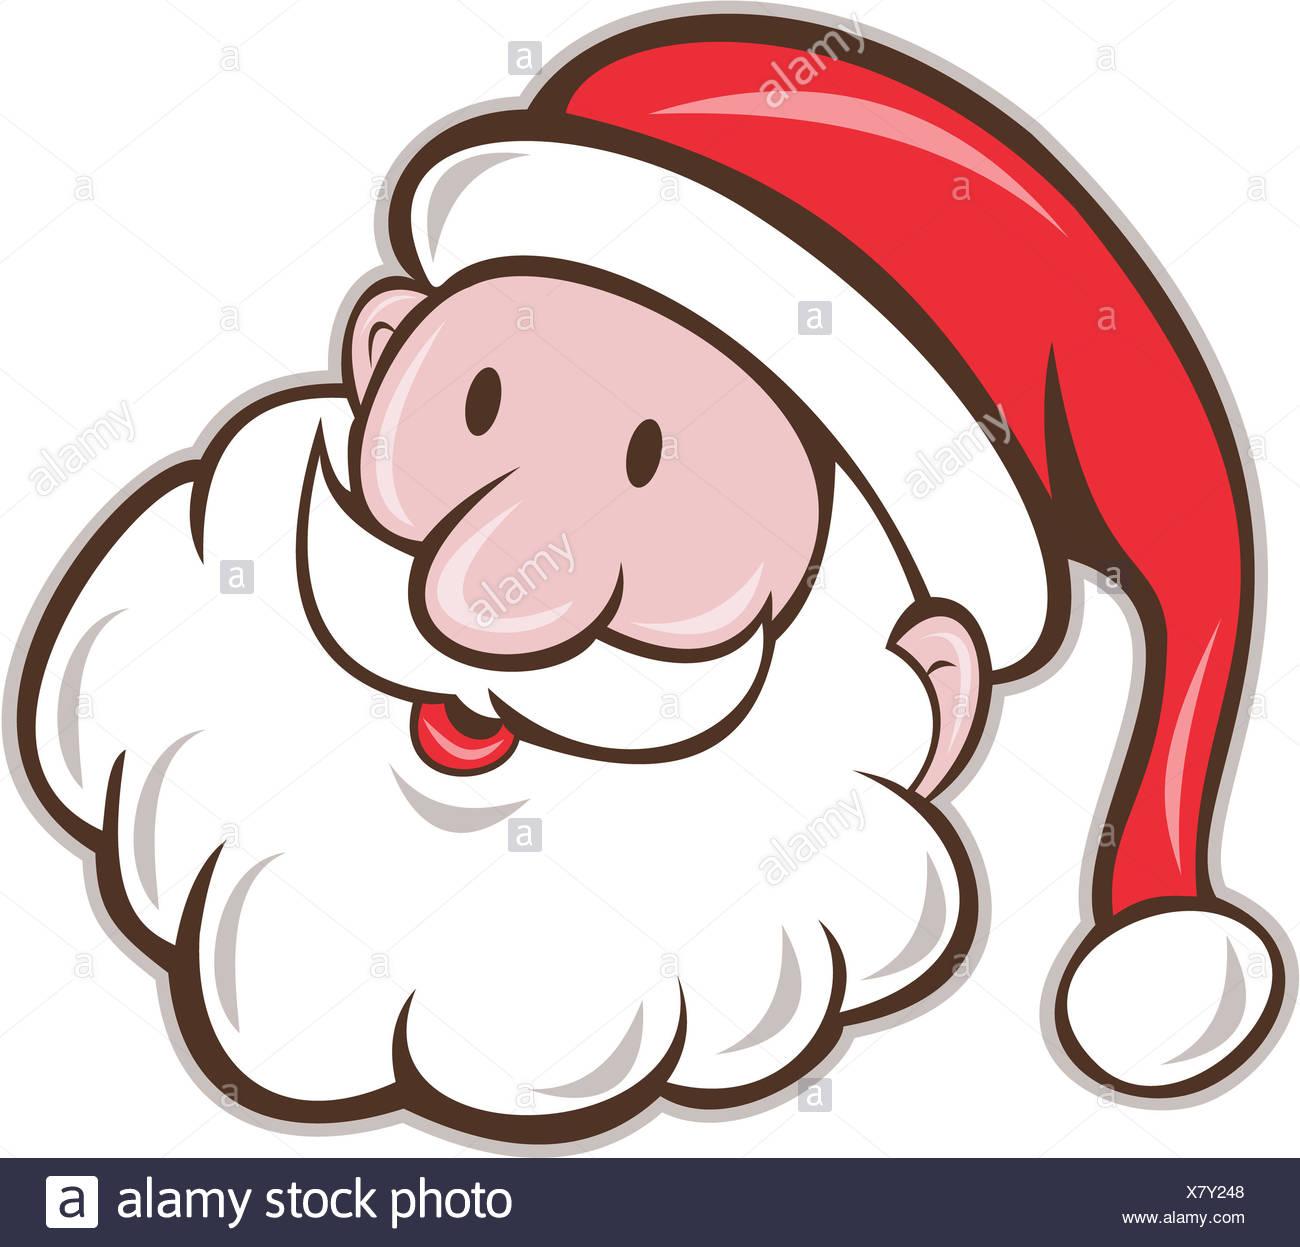 Father Christmas Cartoon Images.Santa Claus Father Christmas Head Smiling Cartoon Stock